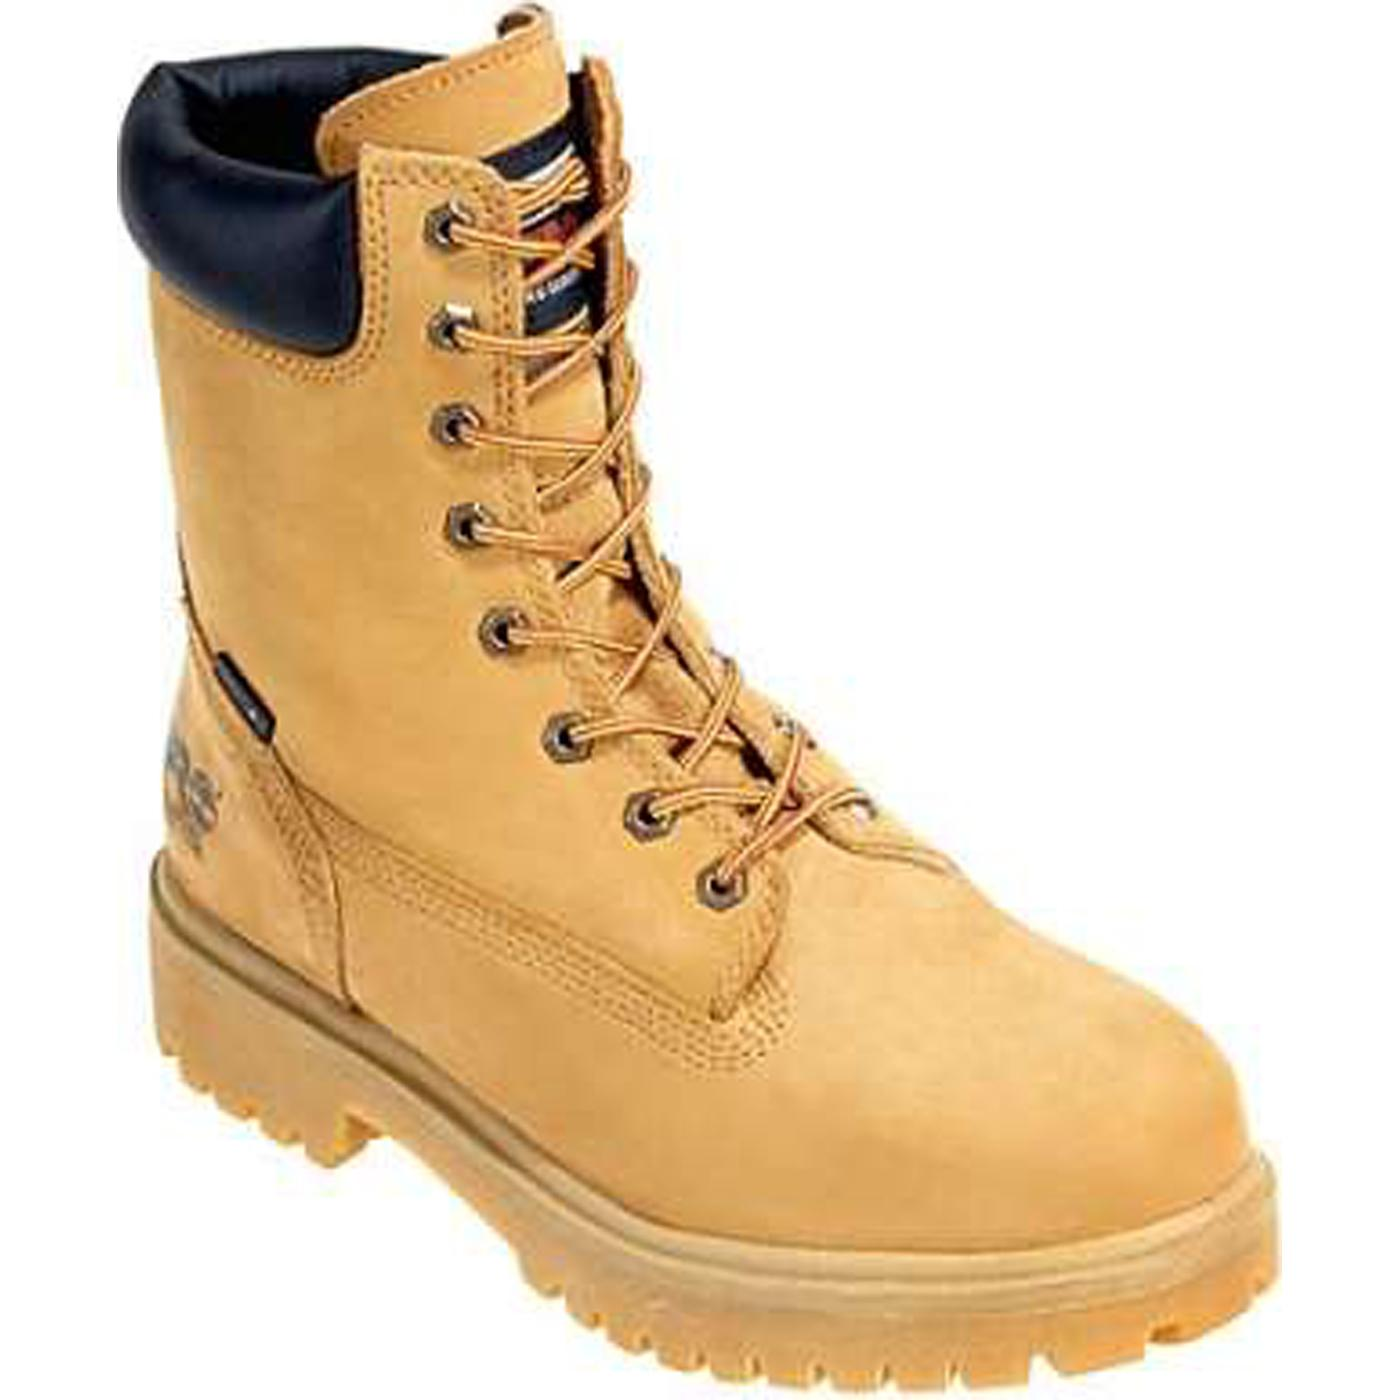 Timberland Pro Steel Toe Waterproof Insulated Boot 26002